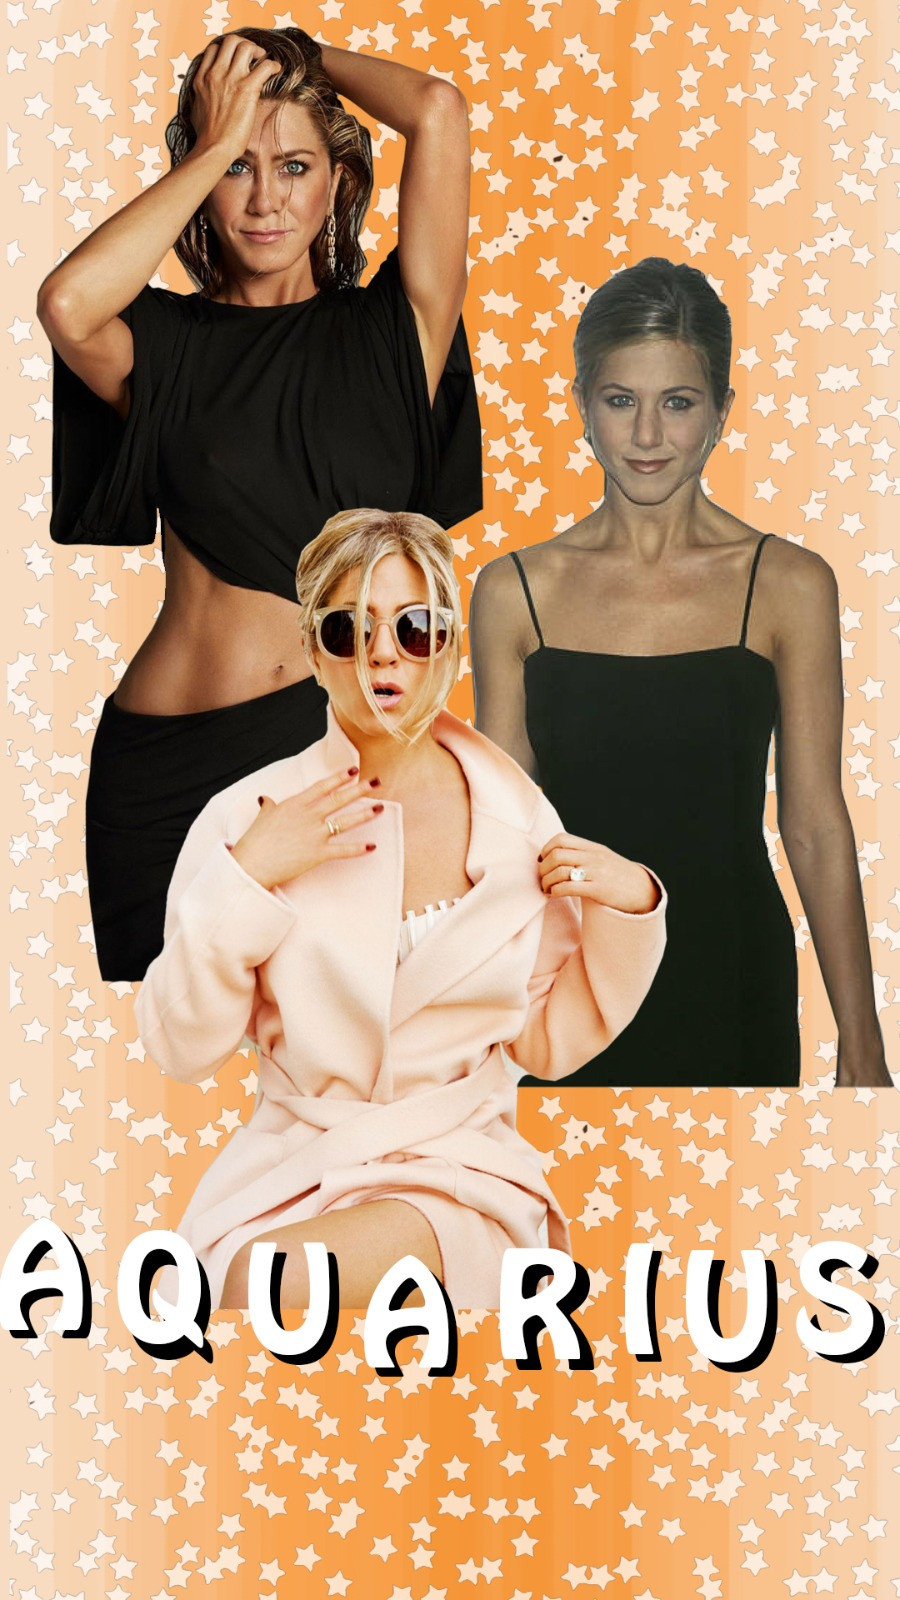 Jennifer Aniston images via Ruven Afanador, Pinterest and @jenniferaniston